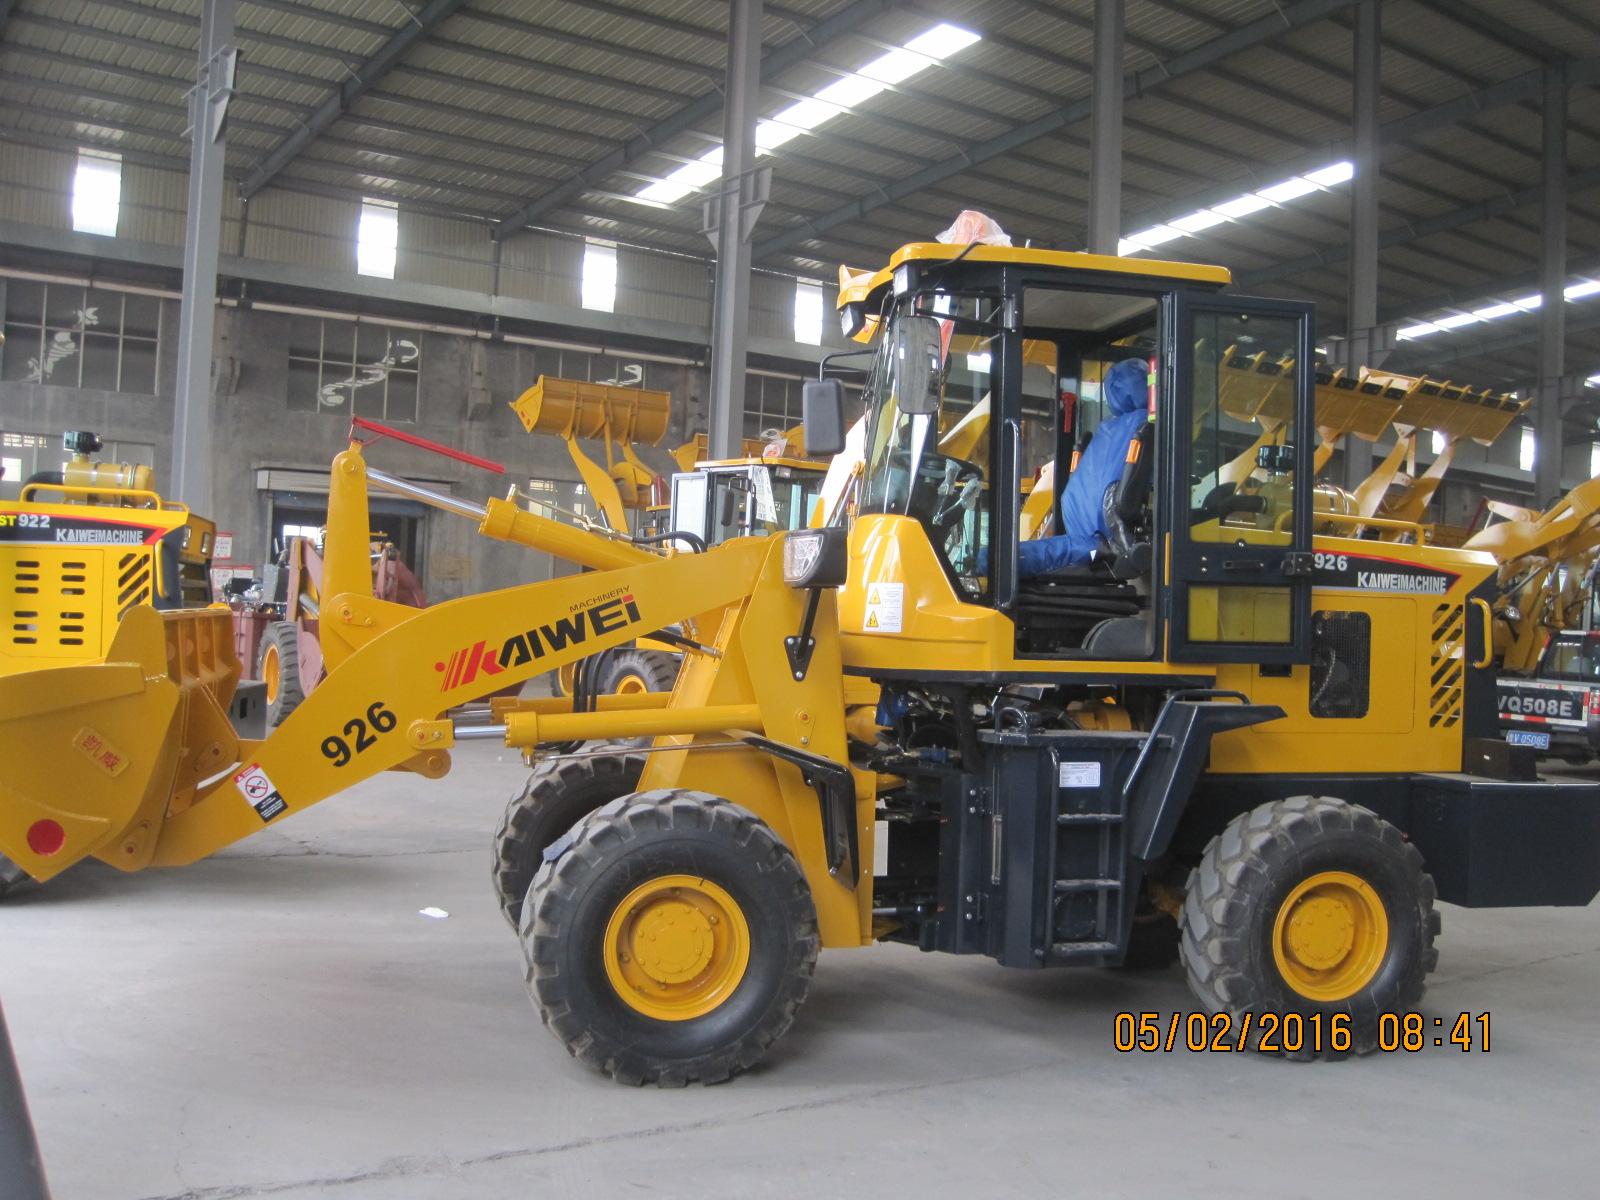 926 heavy construction อุปกรณ์ขนาดเล็กล้อลากสำหรับขาย